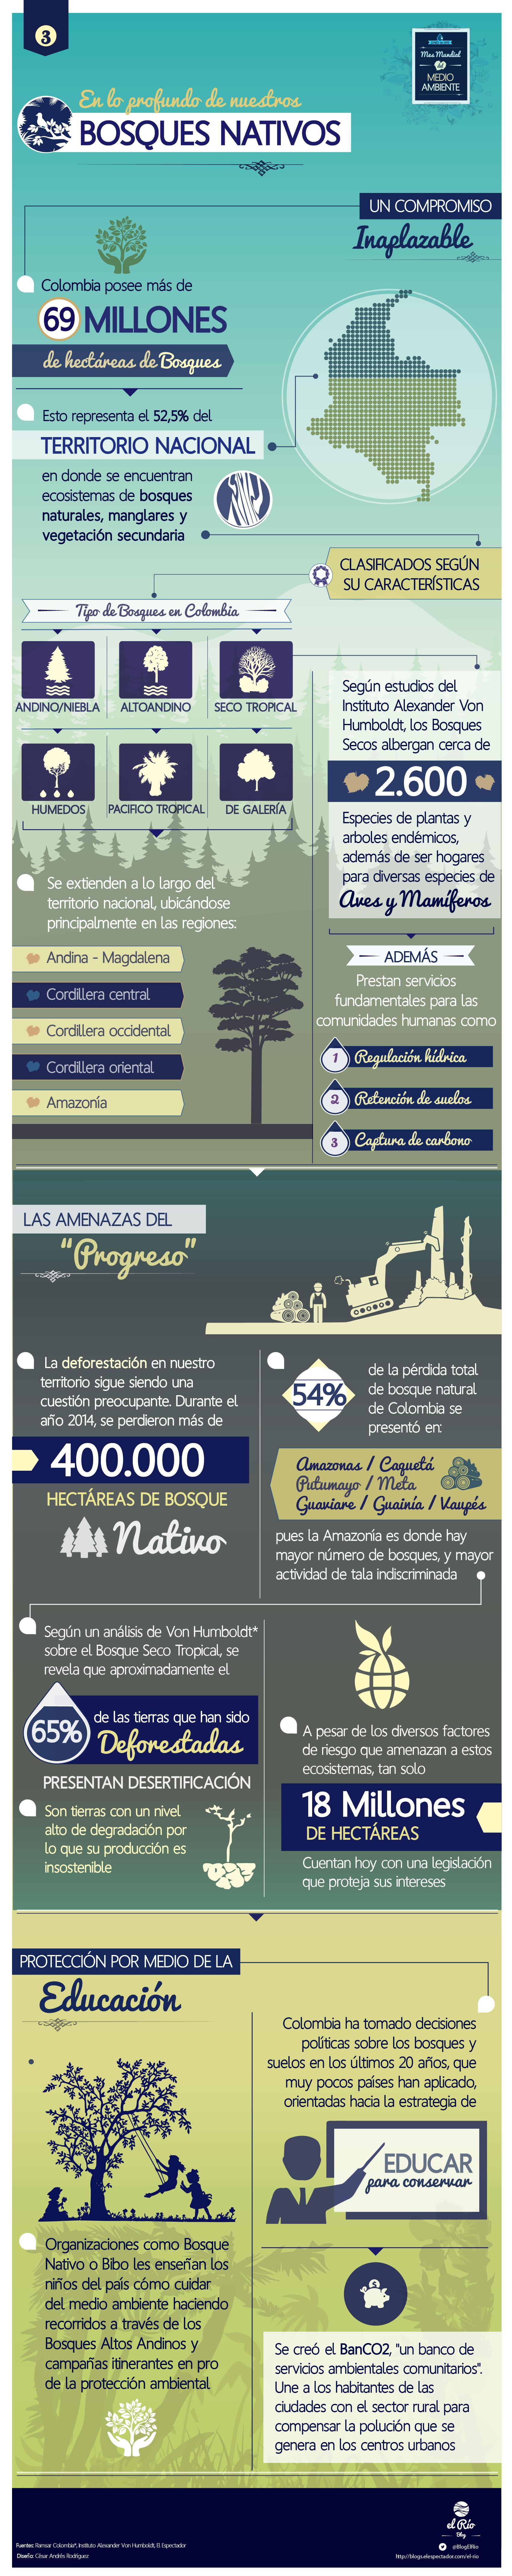 InfografíaDiaMundialDelMedioAmbienteBosques-04-04